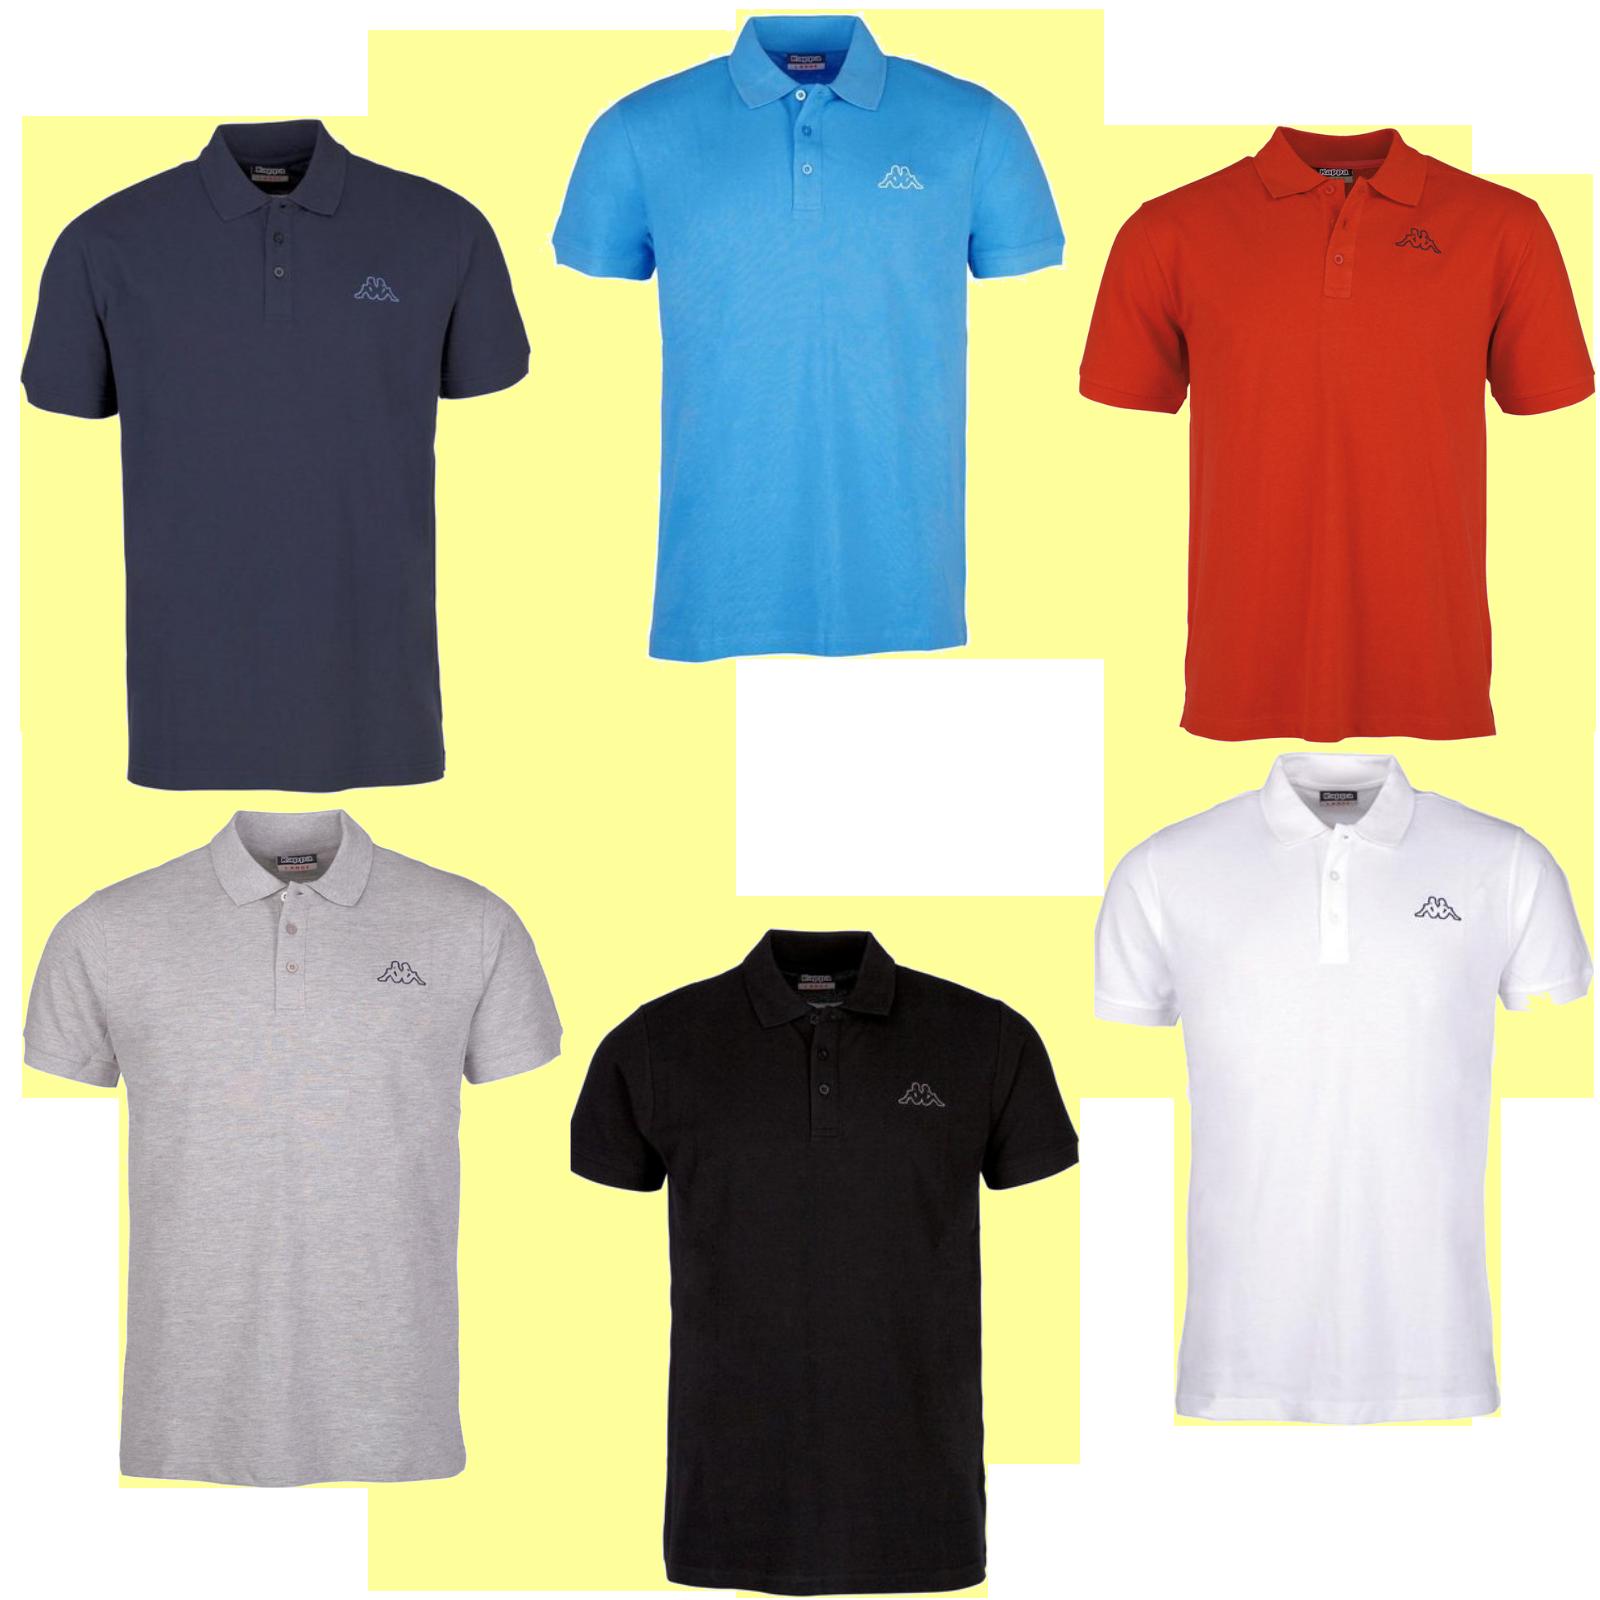 Kappa-Bekleidung-Sportswear-Poloshirts